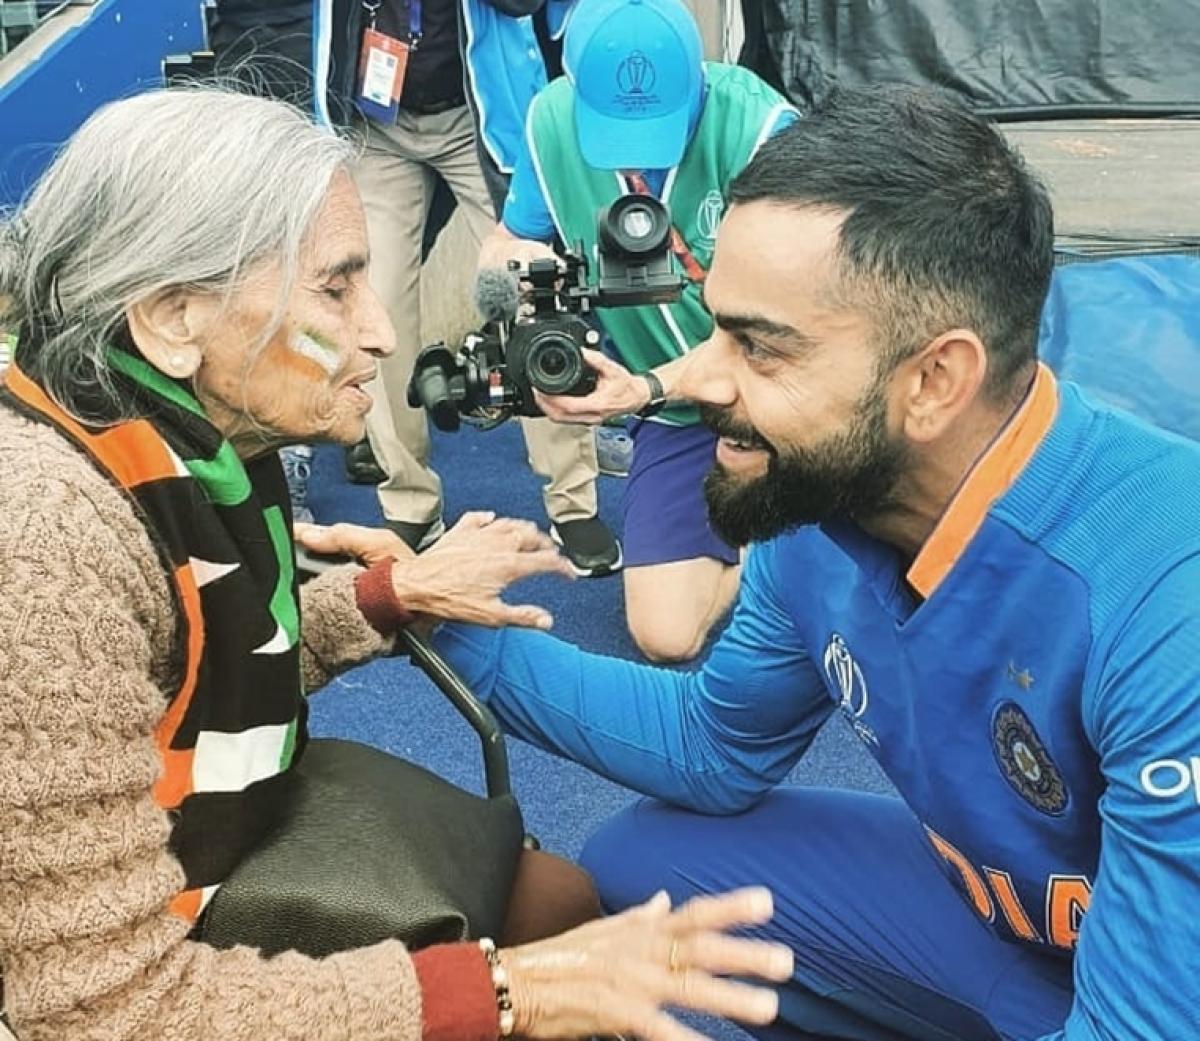 Anushka Sharma, Ranveer Singh comment on Virat Kohli's fan moment with 87-year-old